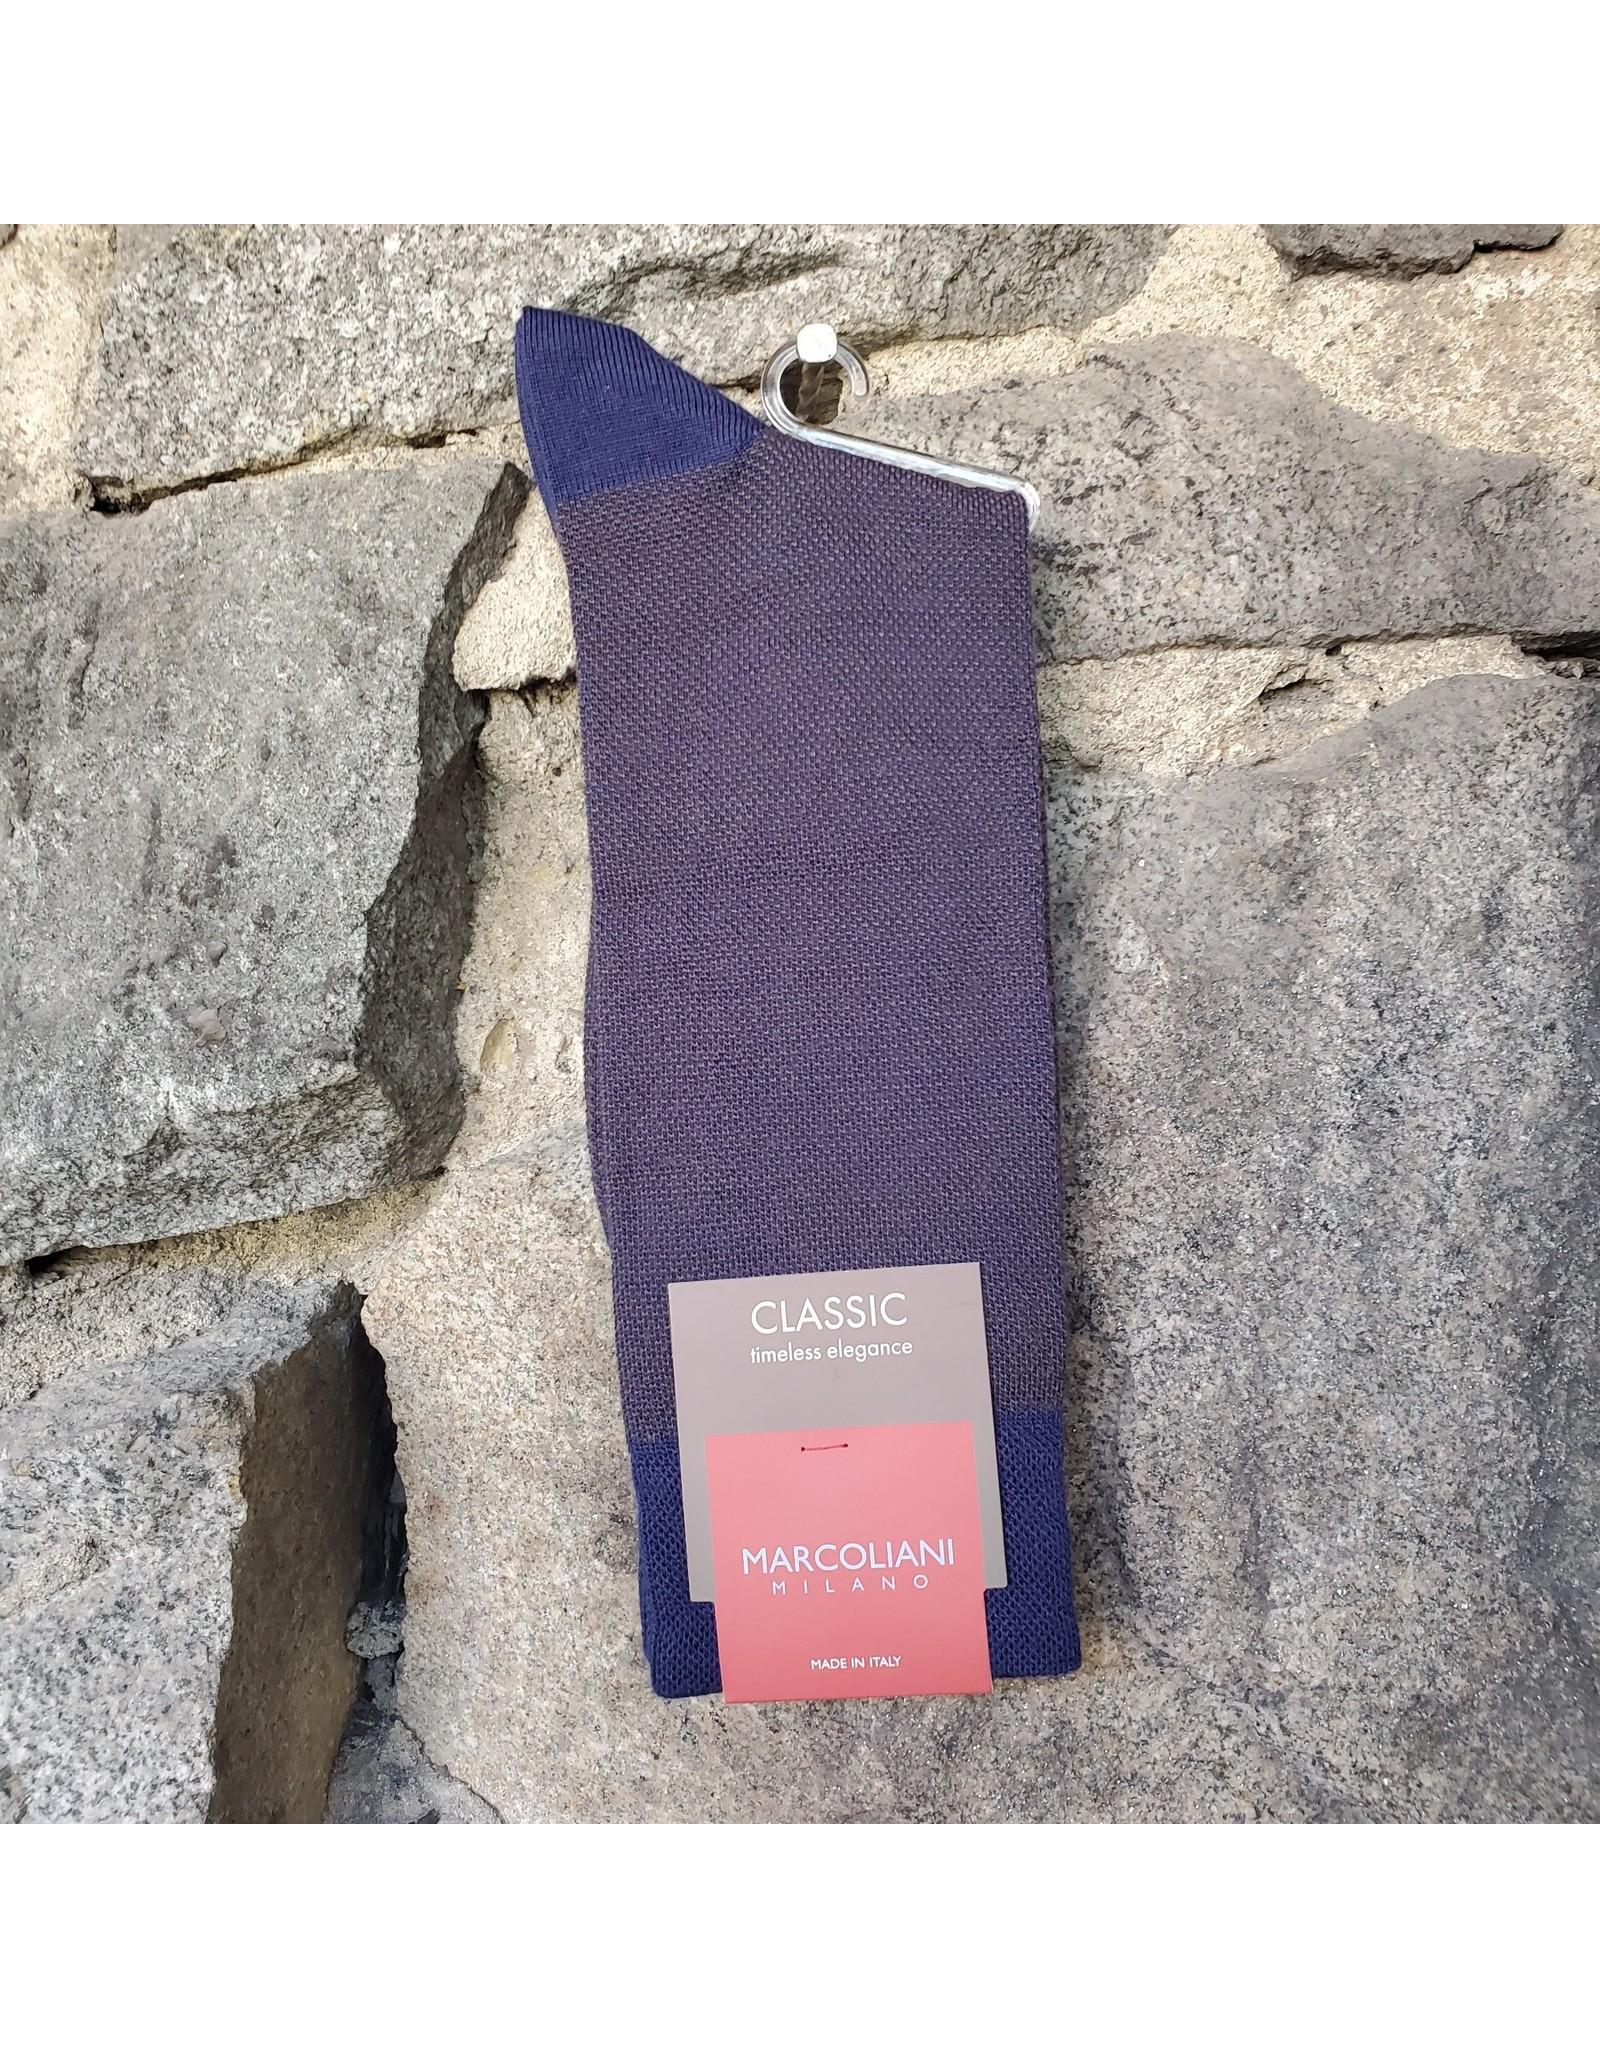 Marcoliani Marcoliani Extrafine Merino Socks - Navy/Brown Birdseye